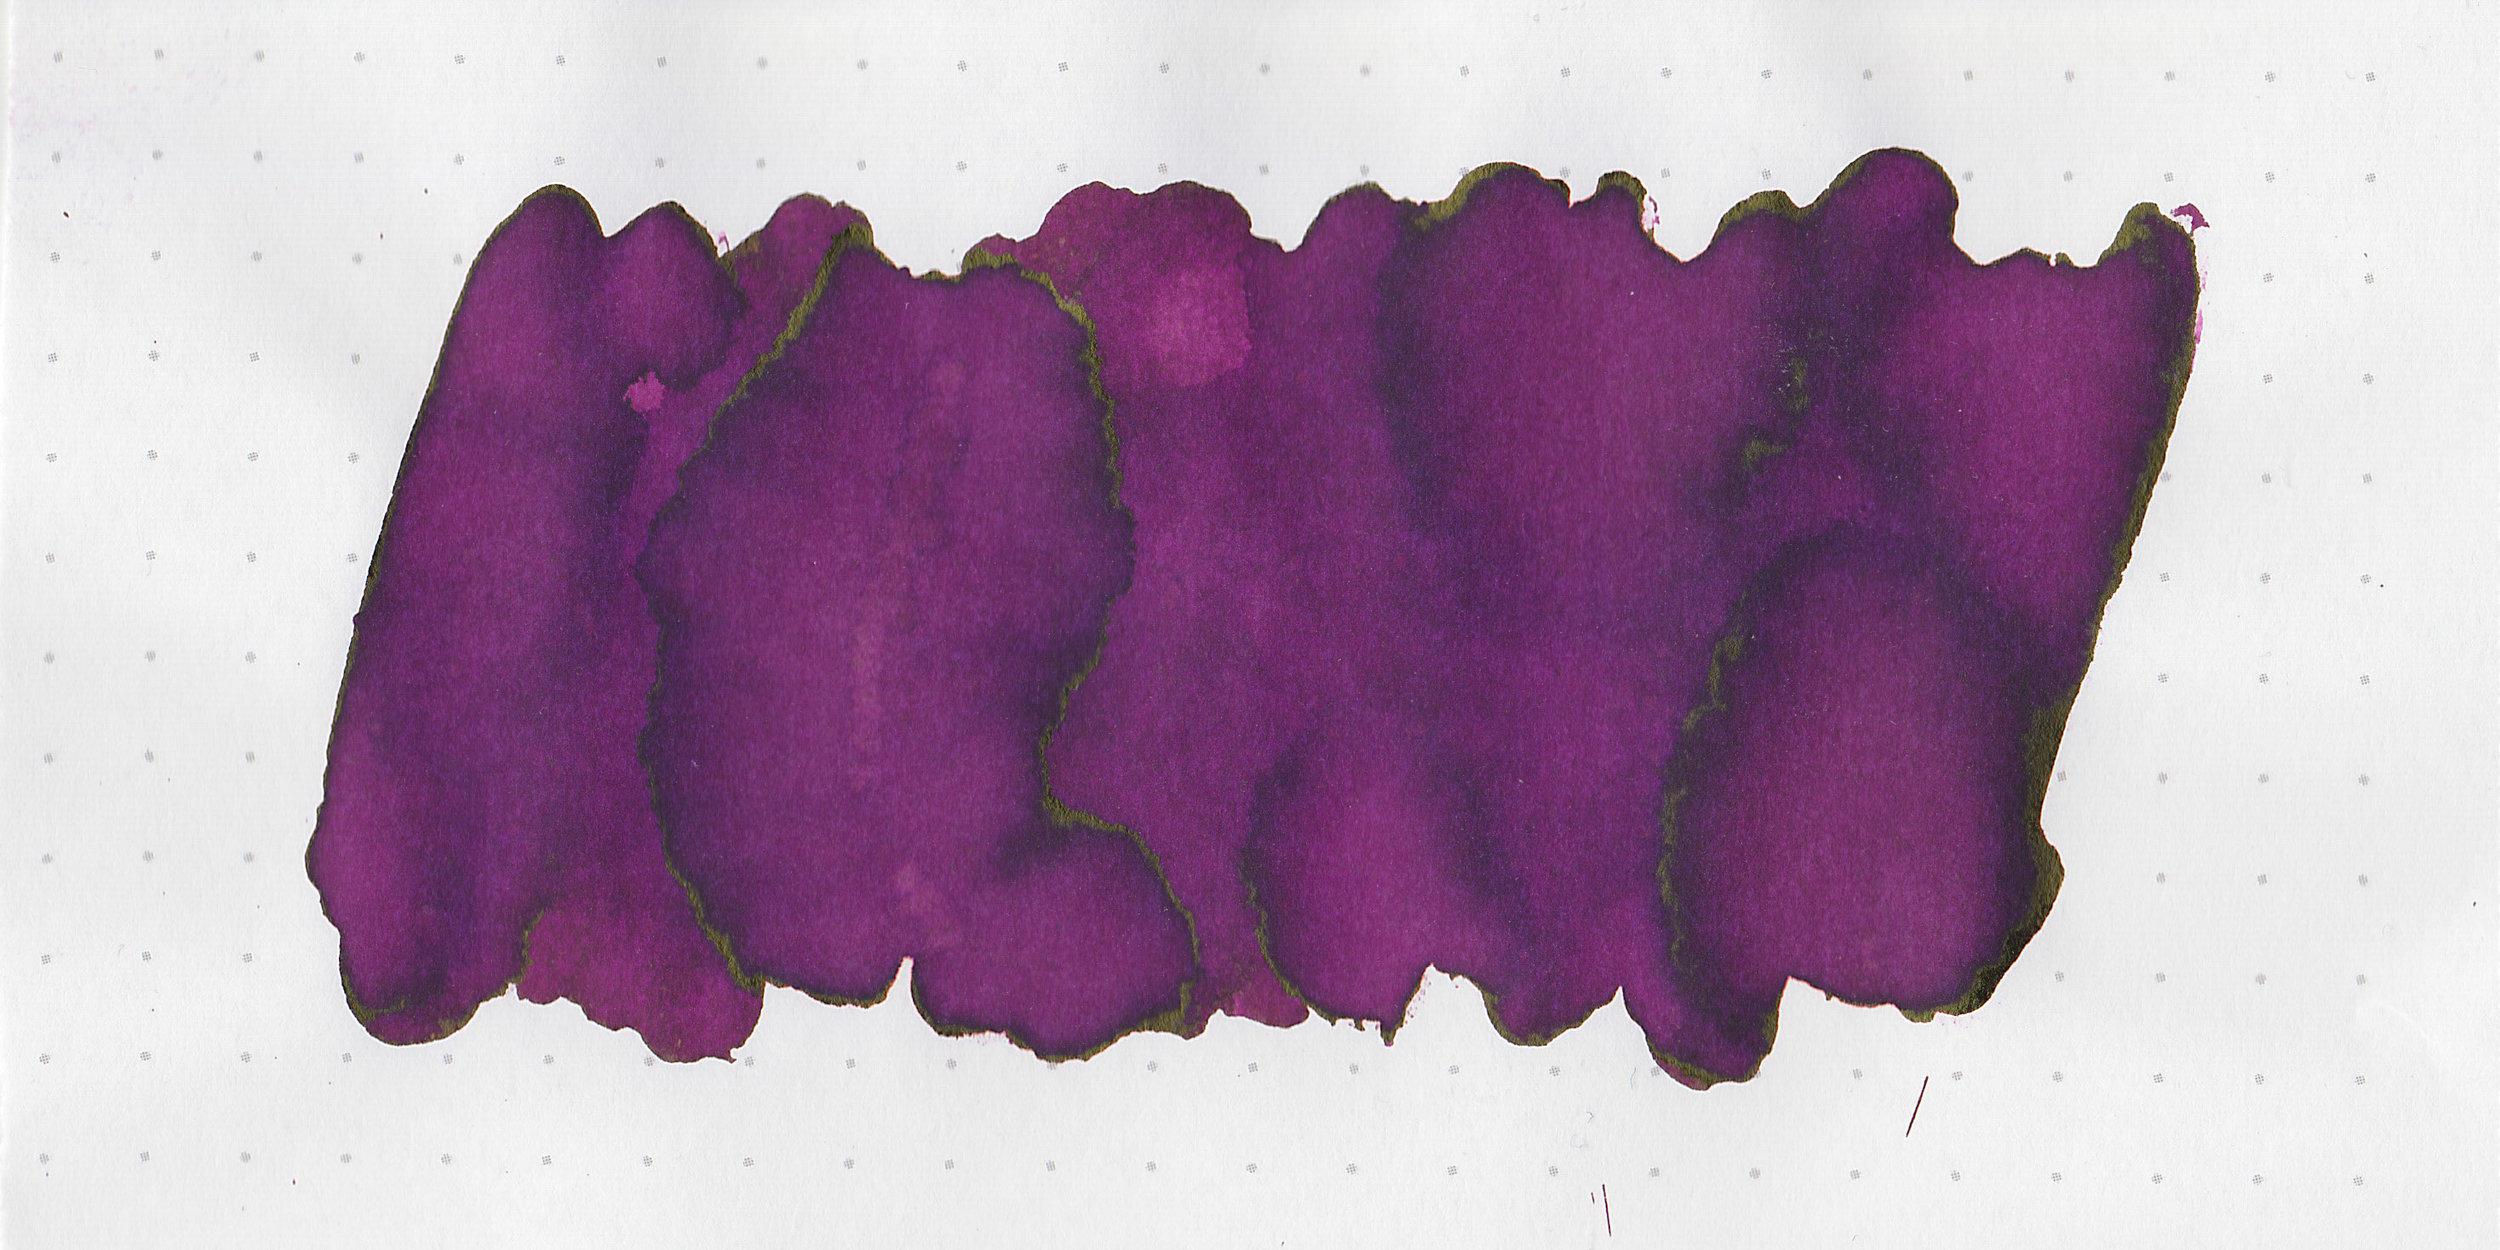 bb-sweet-potato-purple-5.jpg